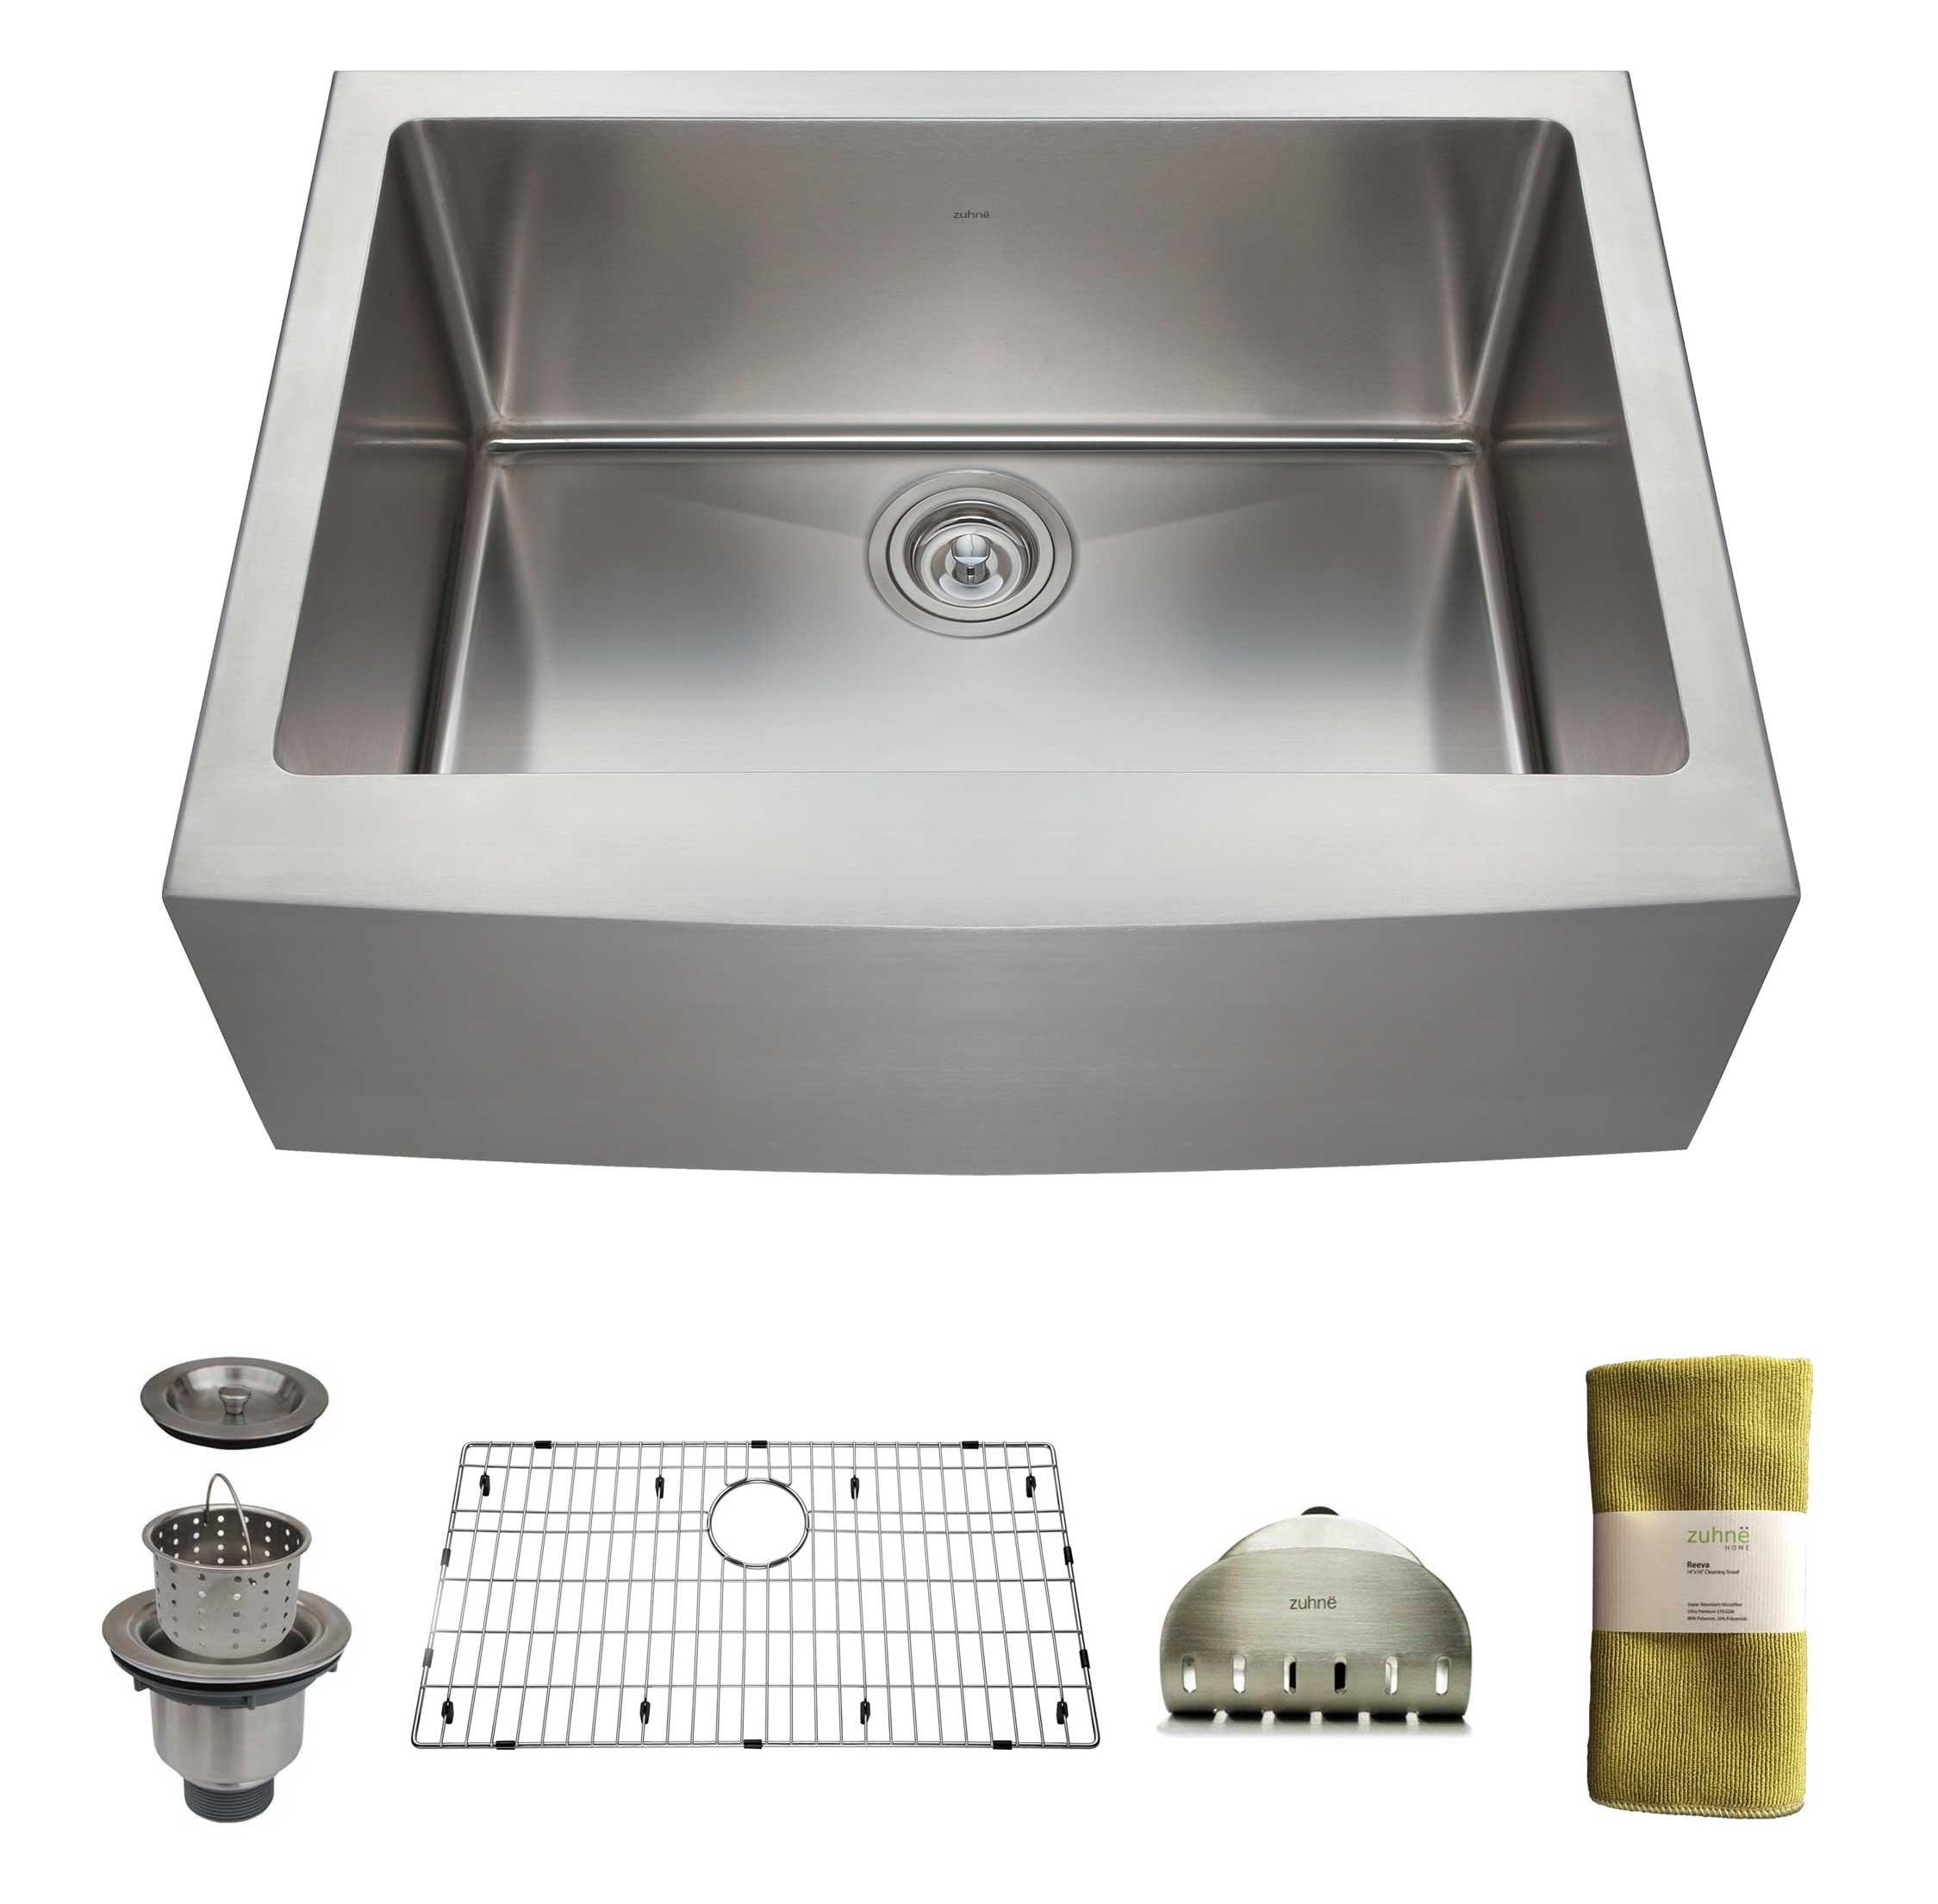 zuhne 24 inch farmhouse apron deep single bowl 16 gauge stainless steel luxury kitchen sink 813tky1oasl jpg  rh   chickadeesolutions com